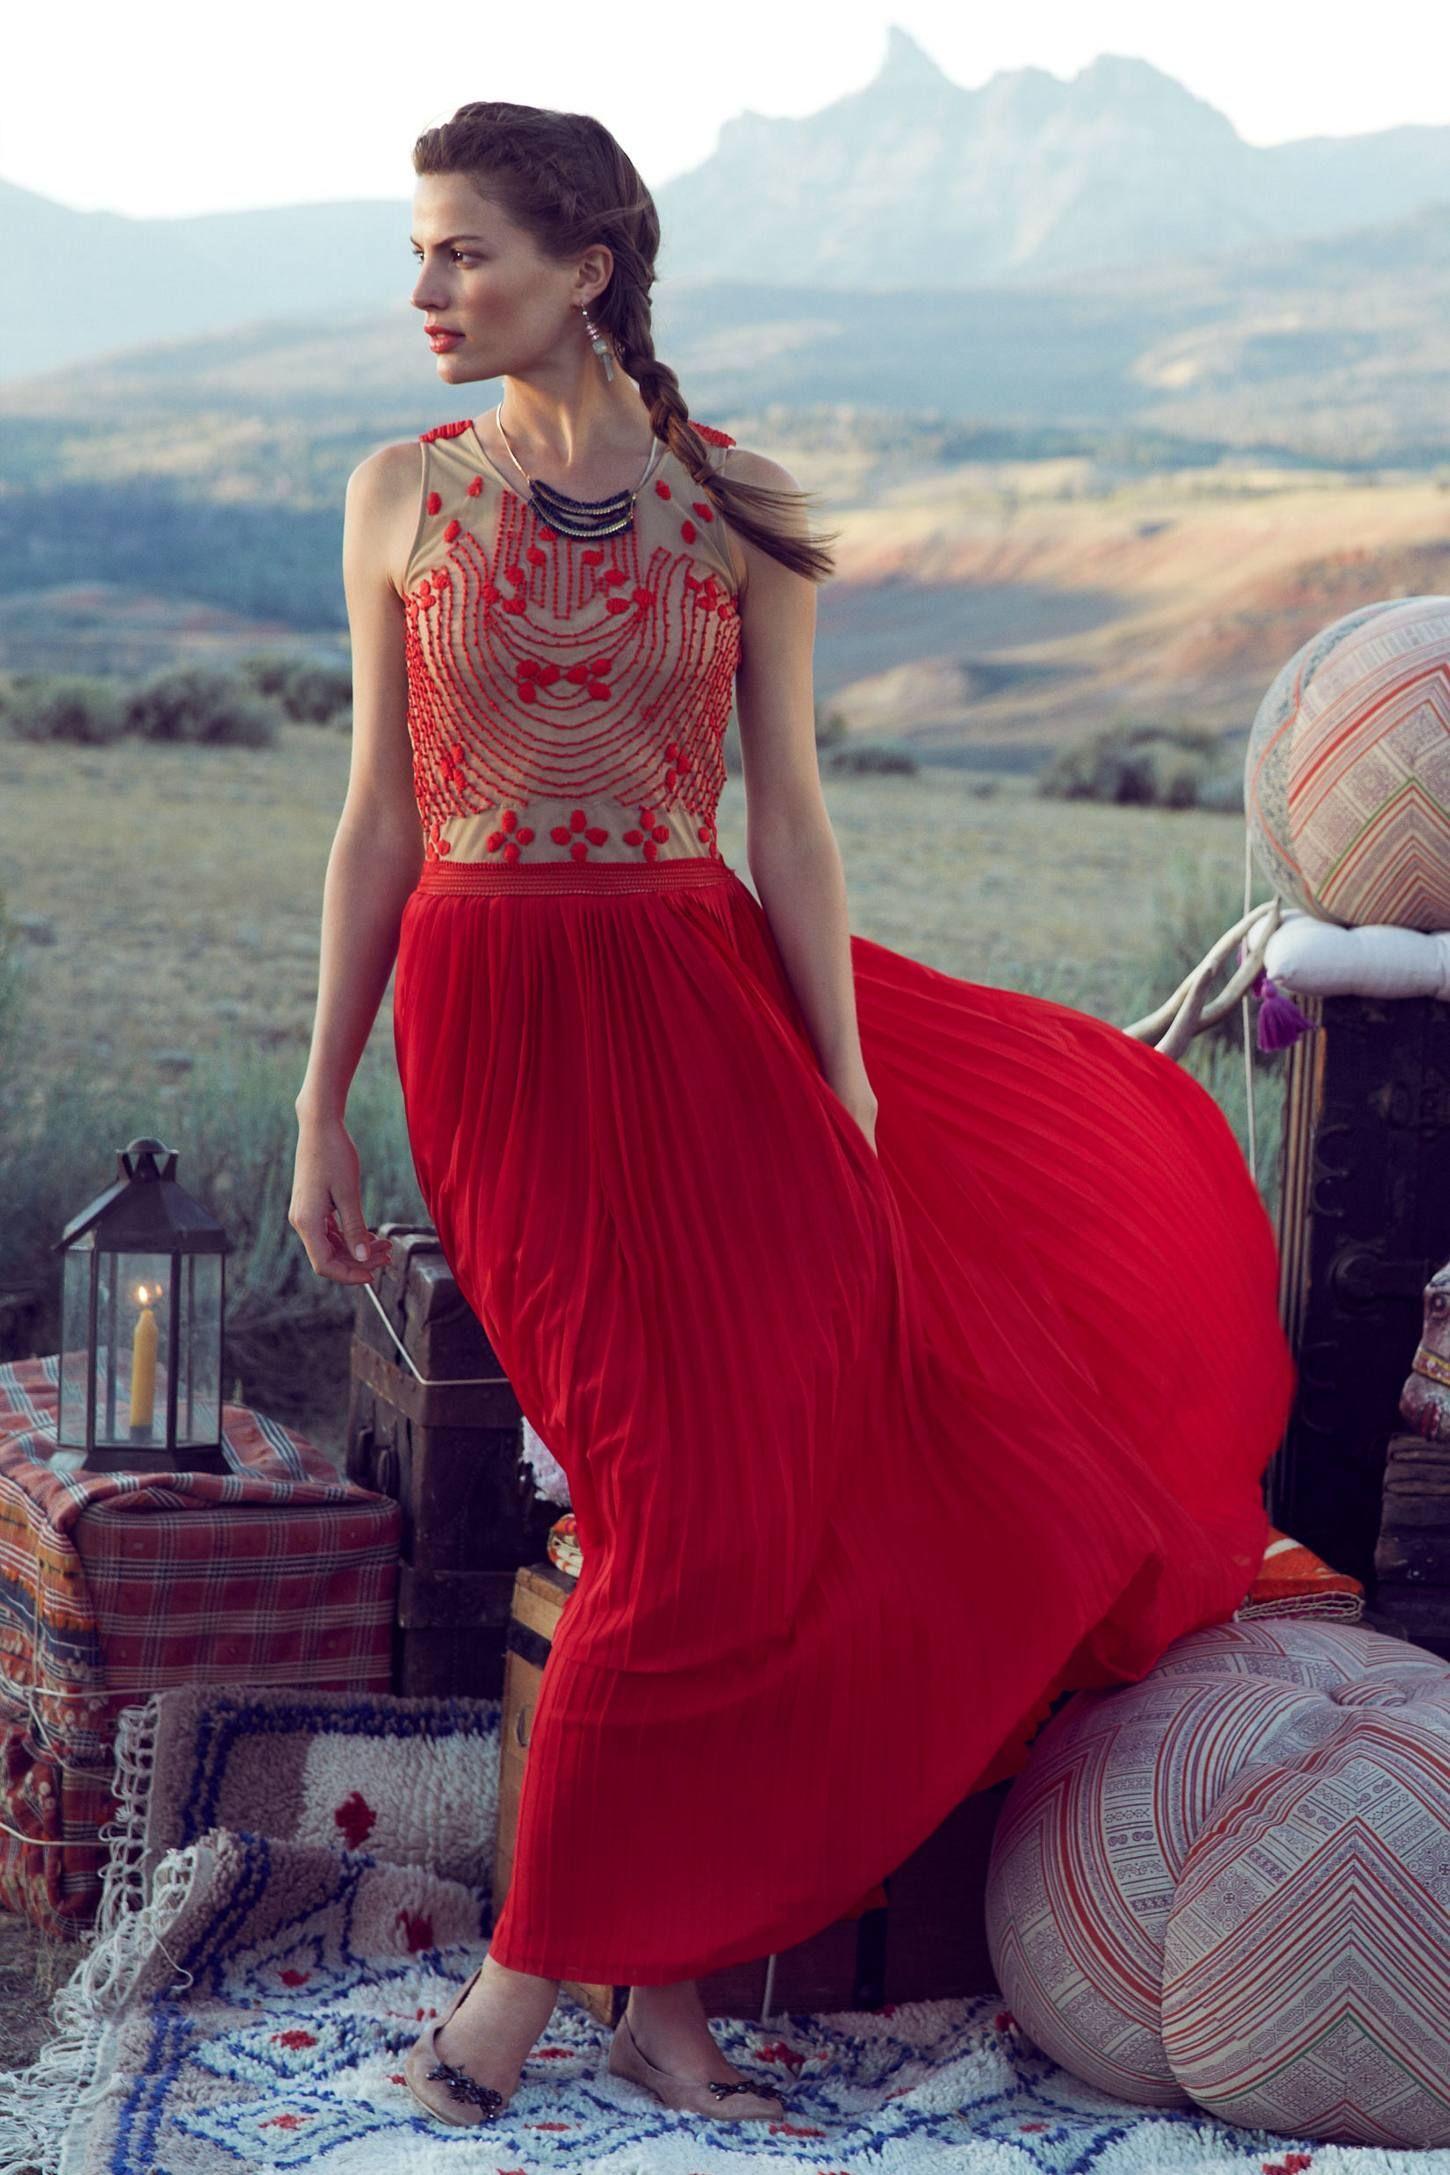 Rubied dusk dress vogue pinterest dusk anthropologie and clothes